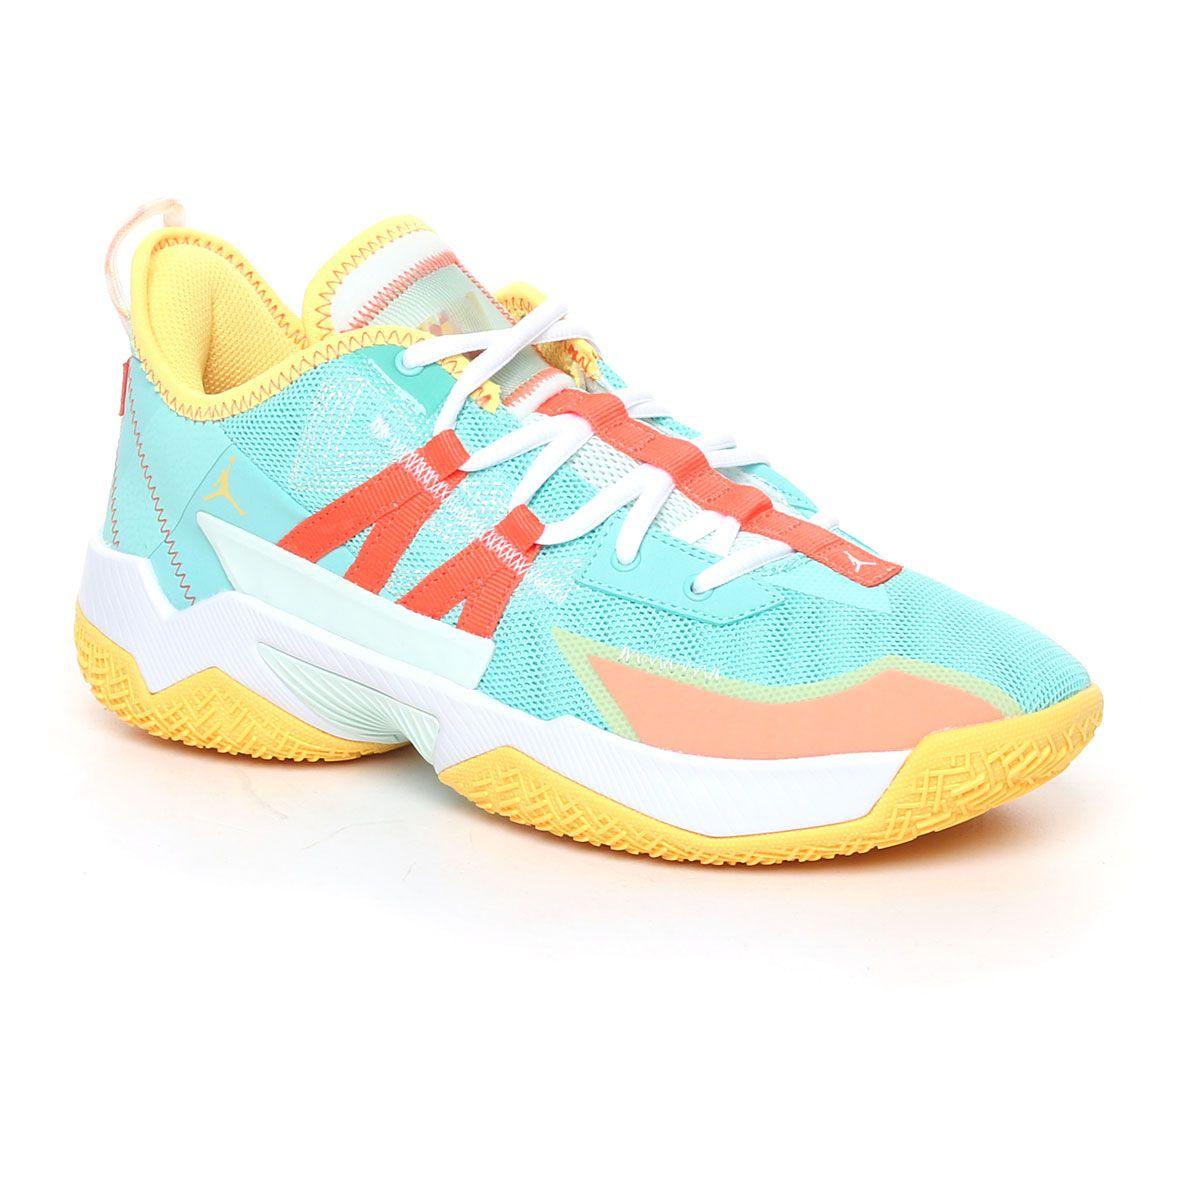 Nike Jordan One Take Uomo Azzurro Giallo Arancione